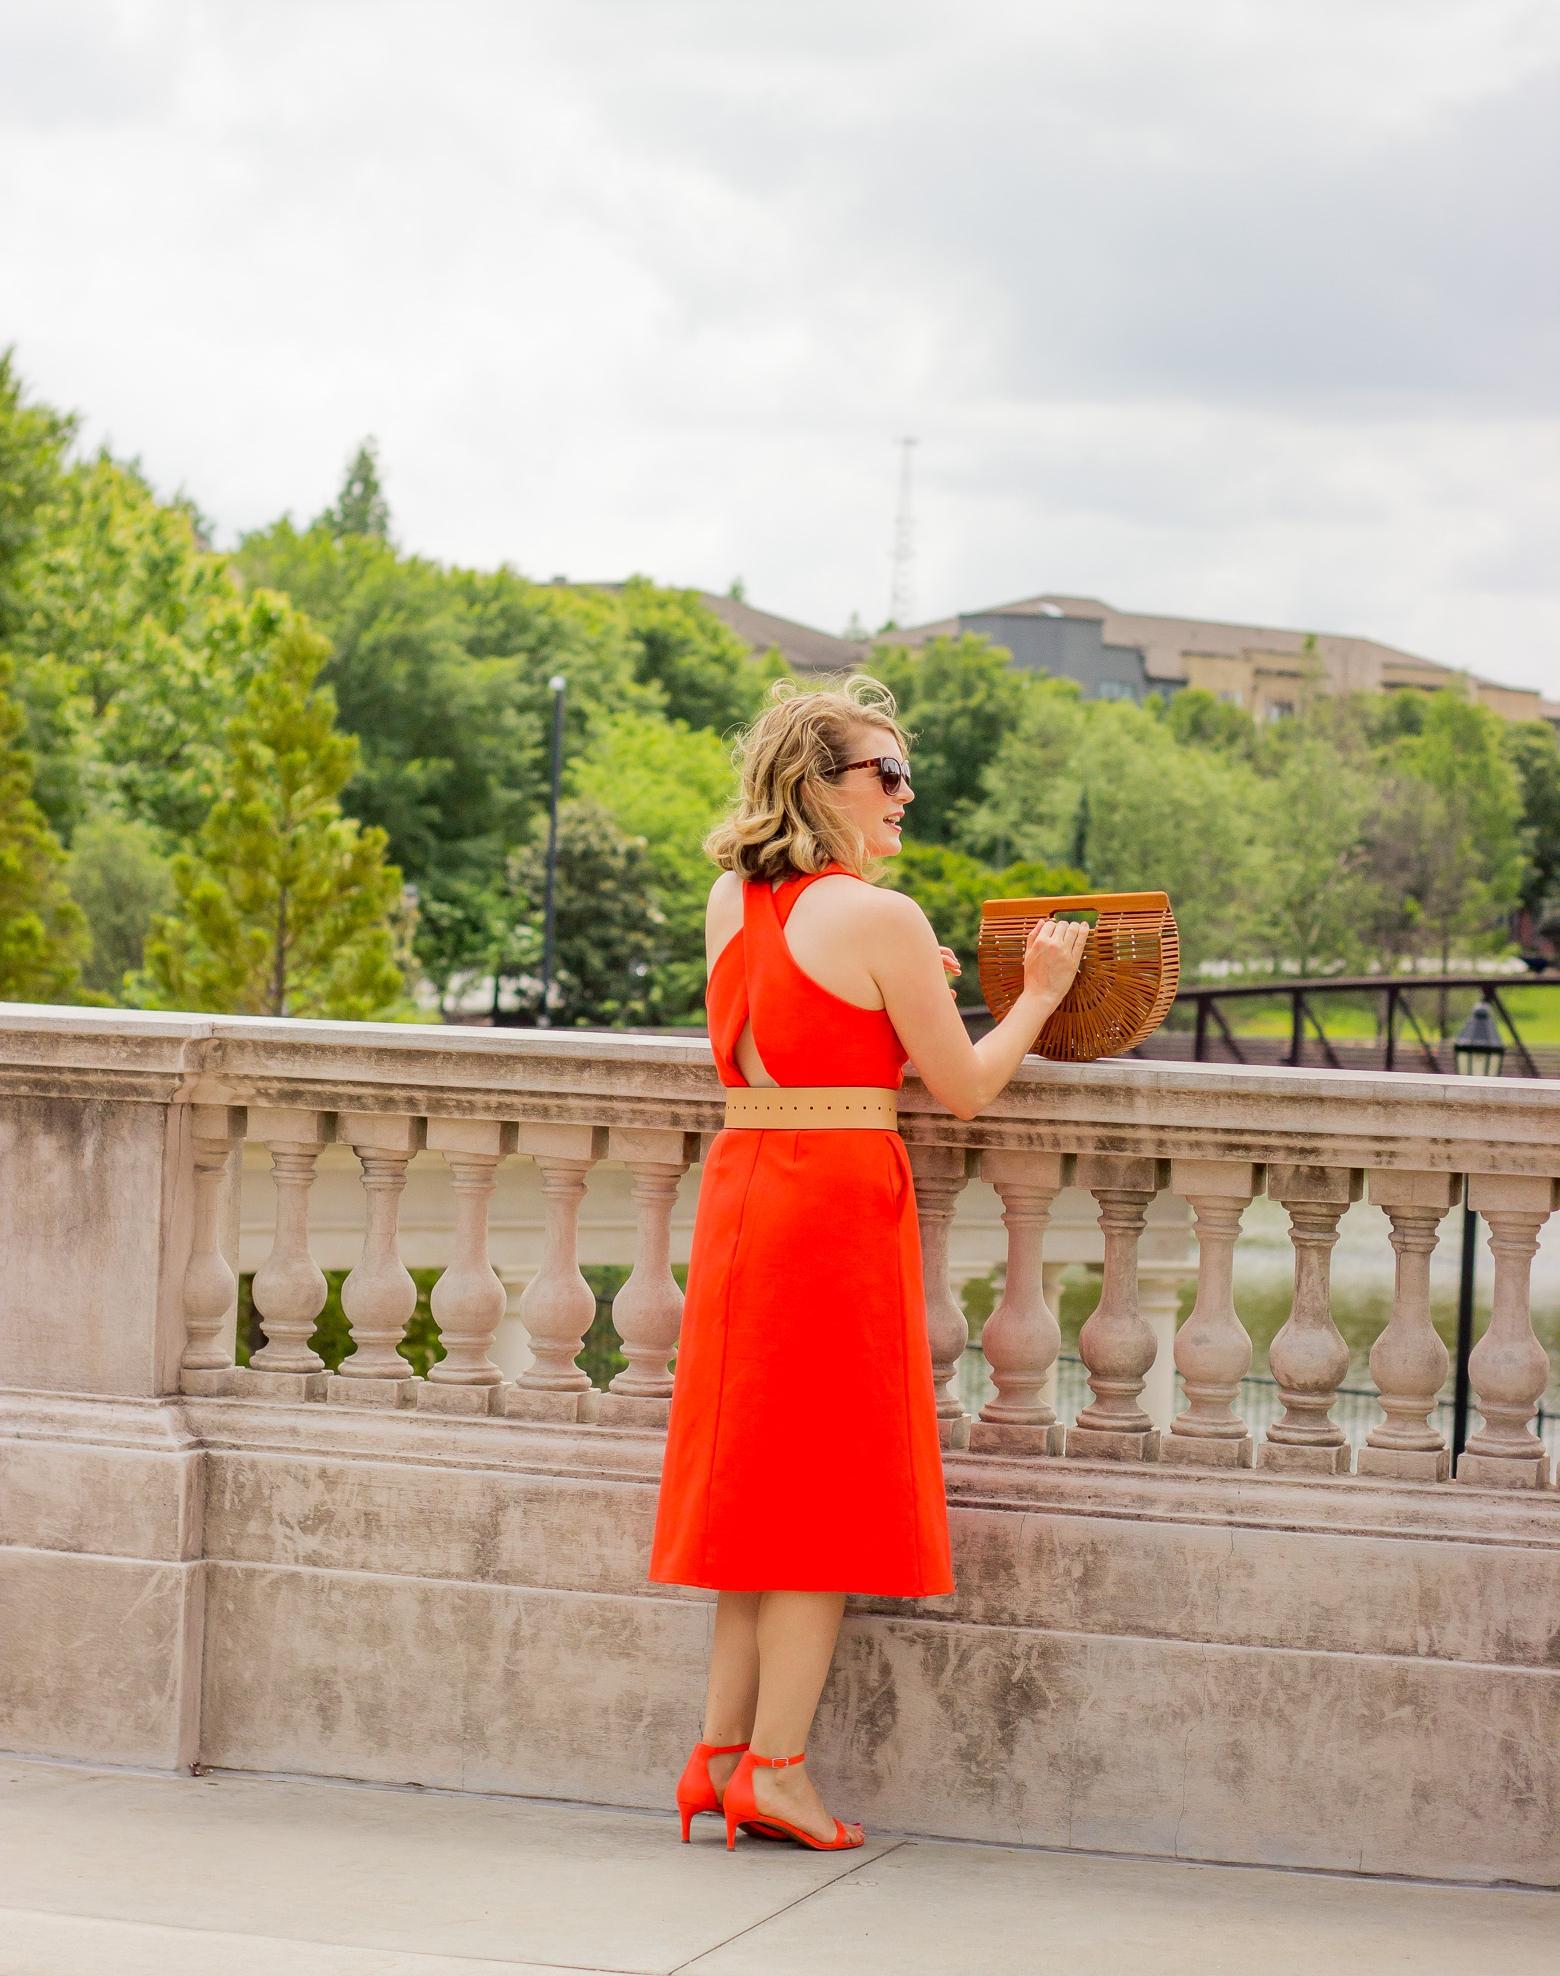 Midi dress and kitten heels on Belle Meets World blog